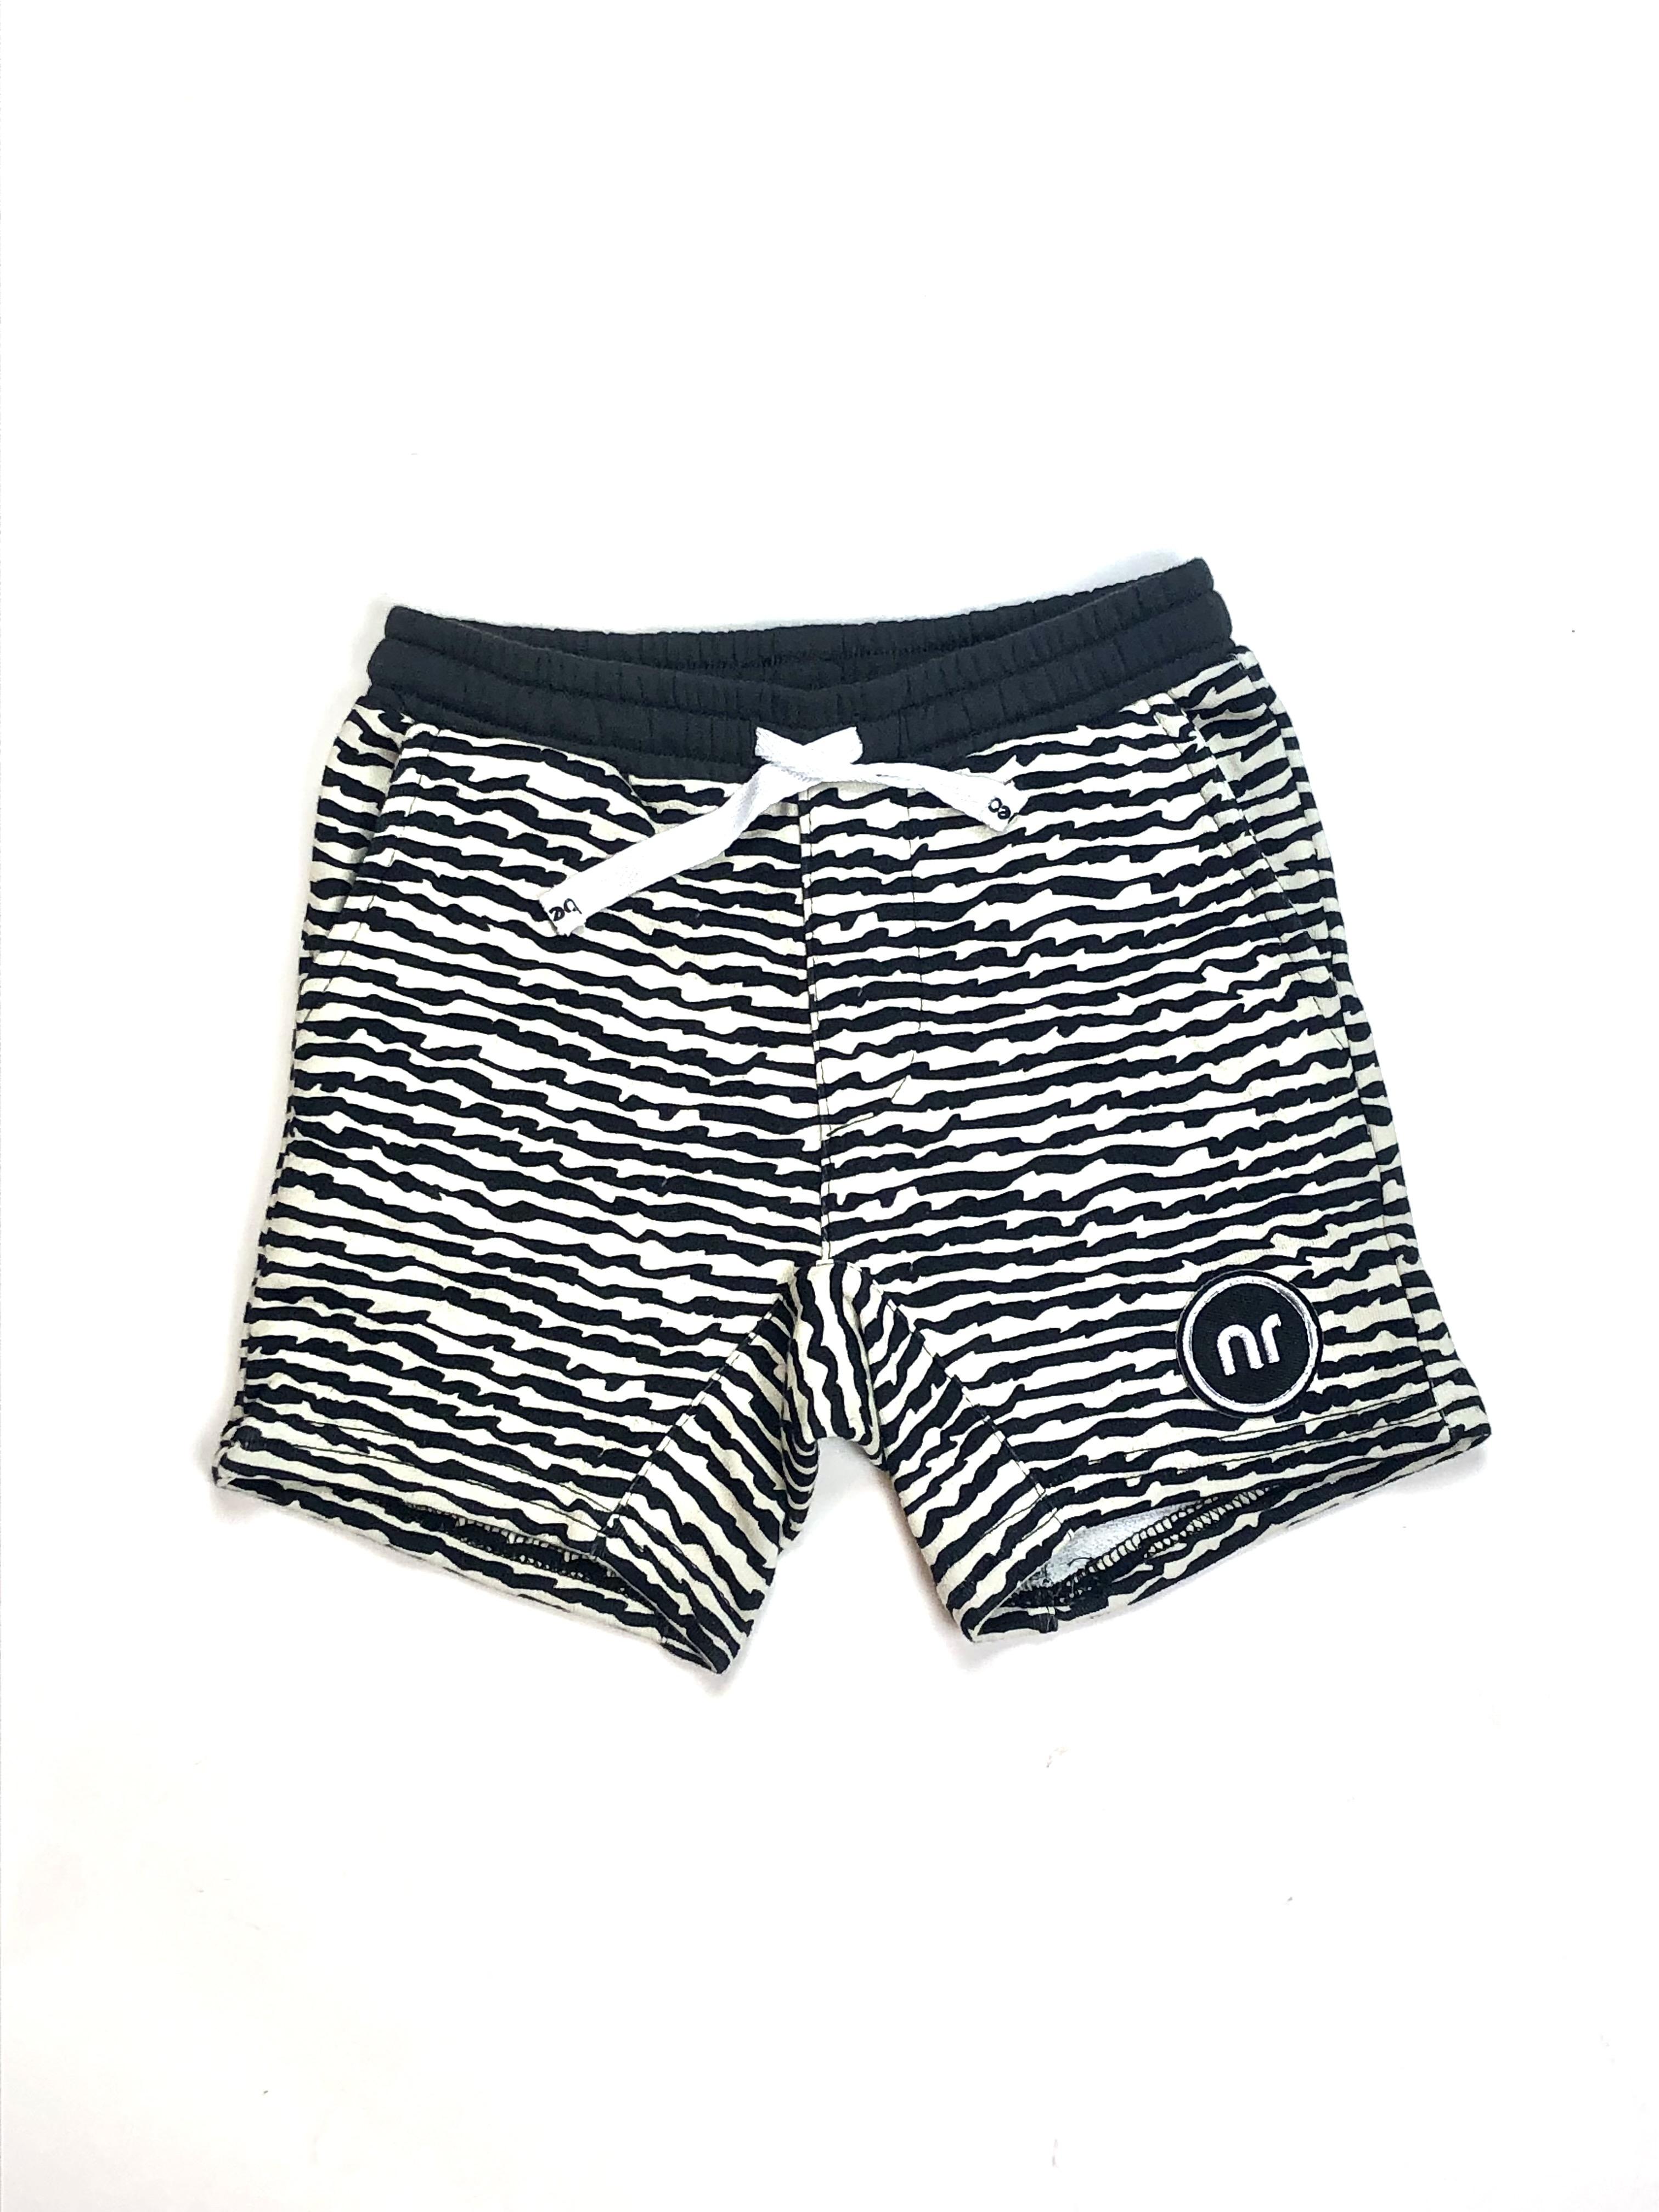 Neon Rebels 3T Shorts